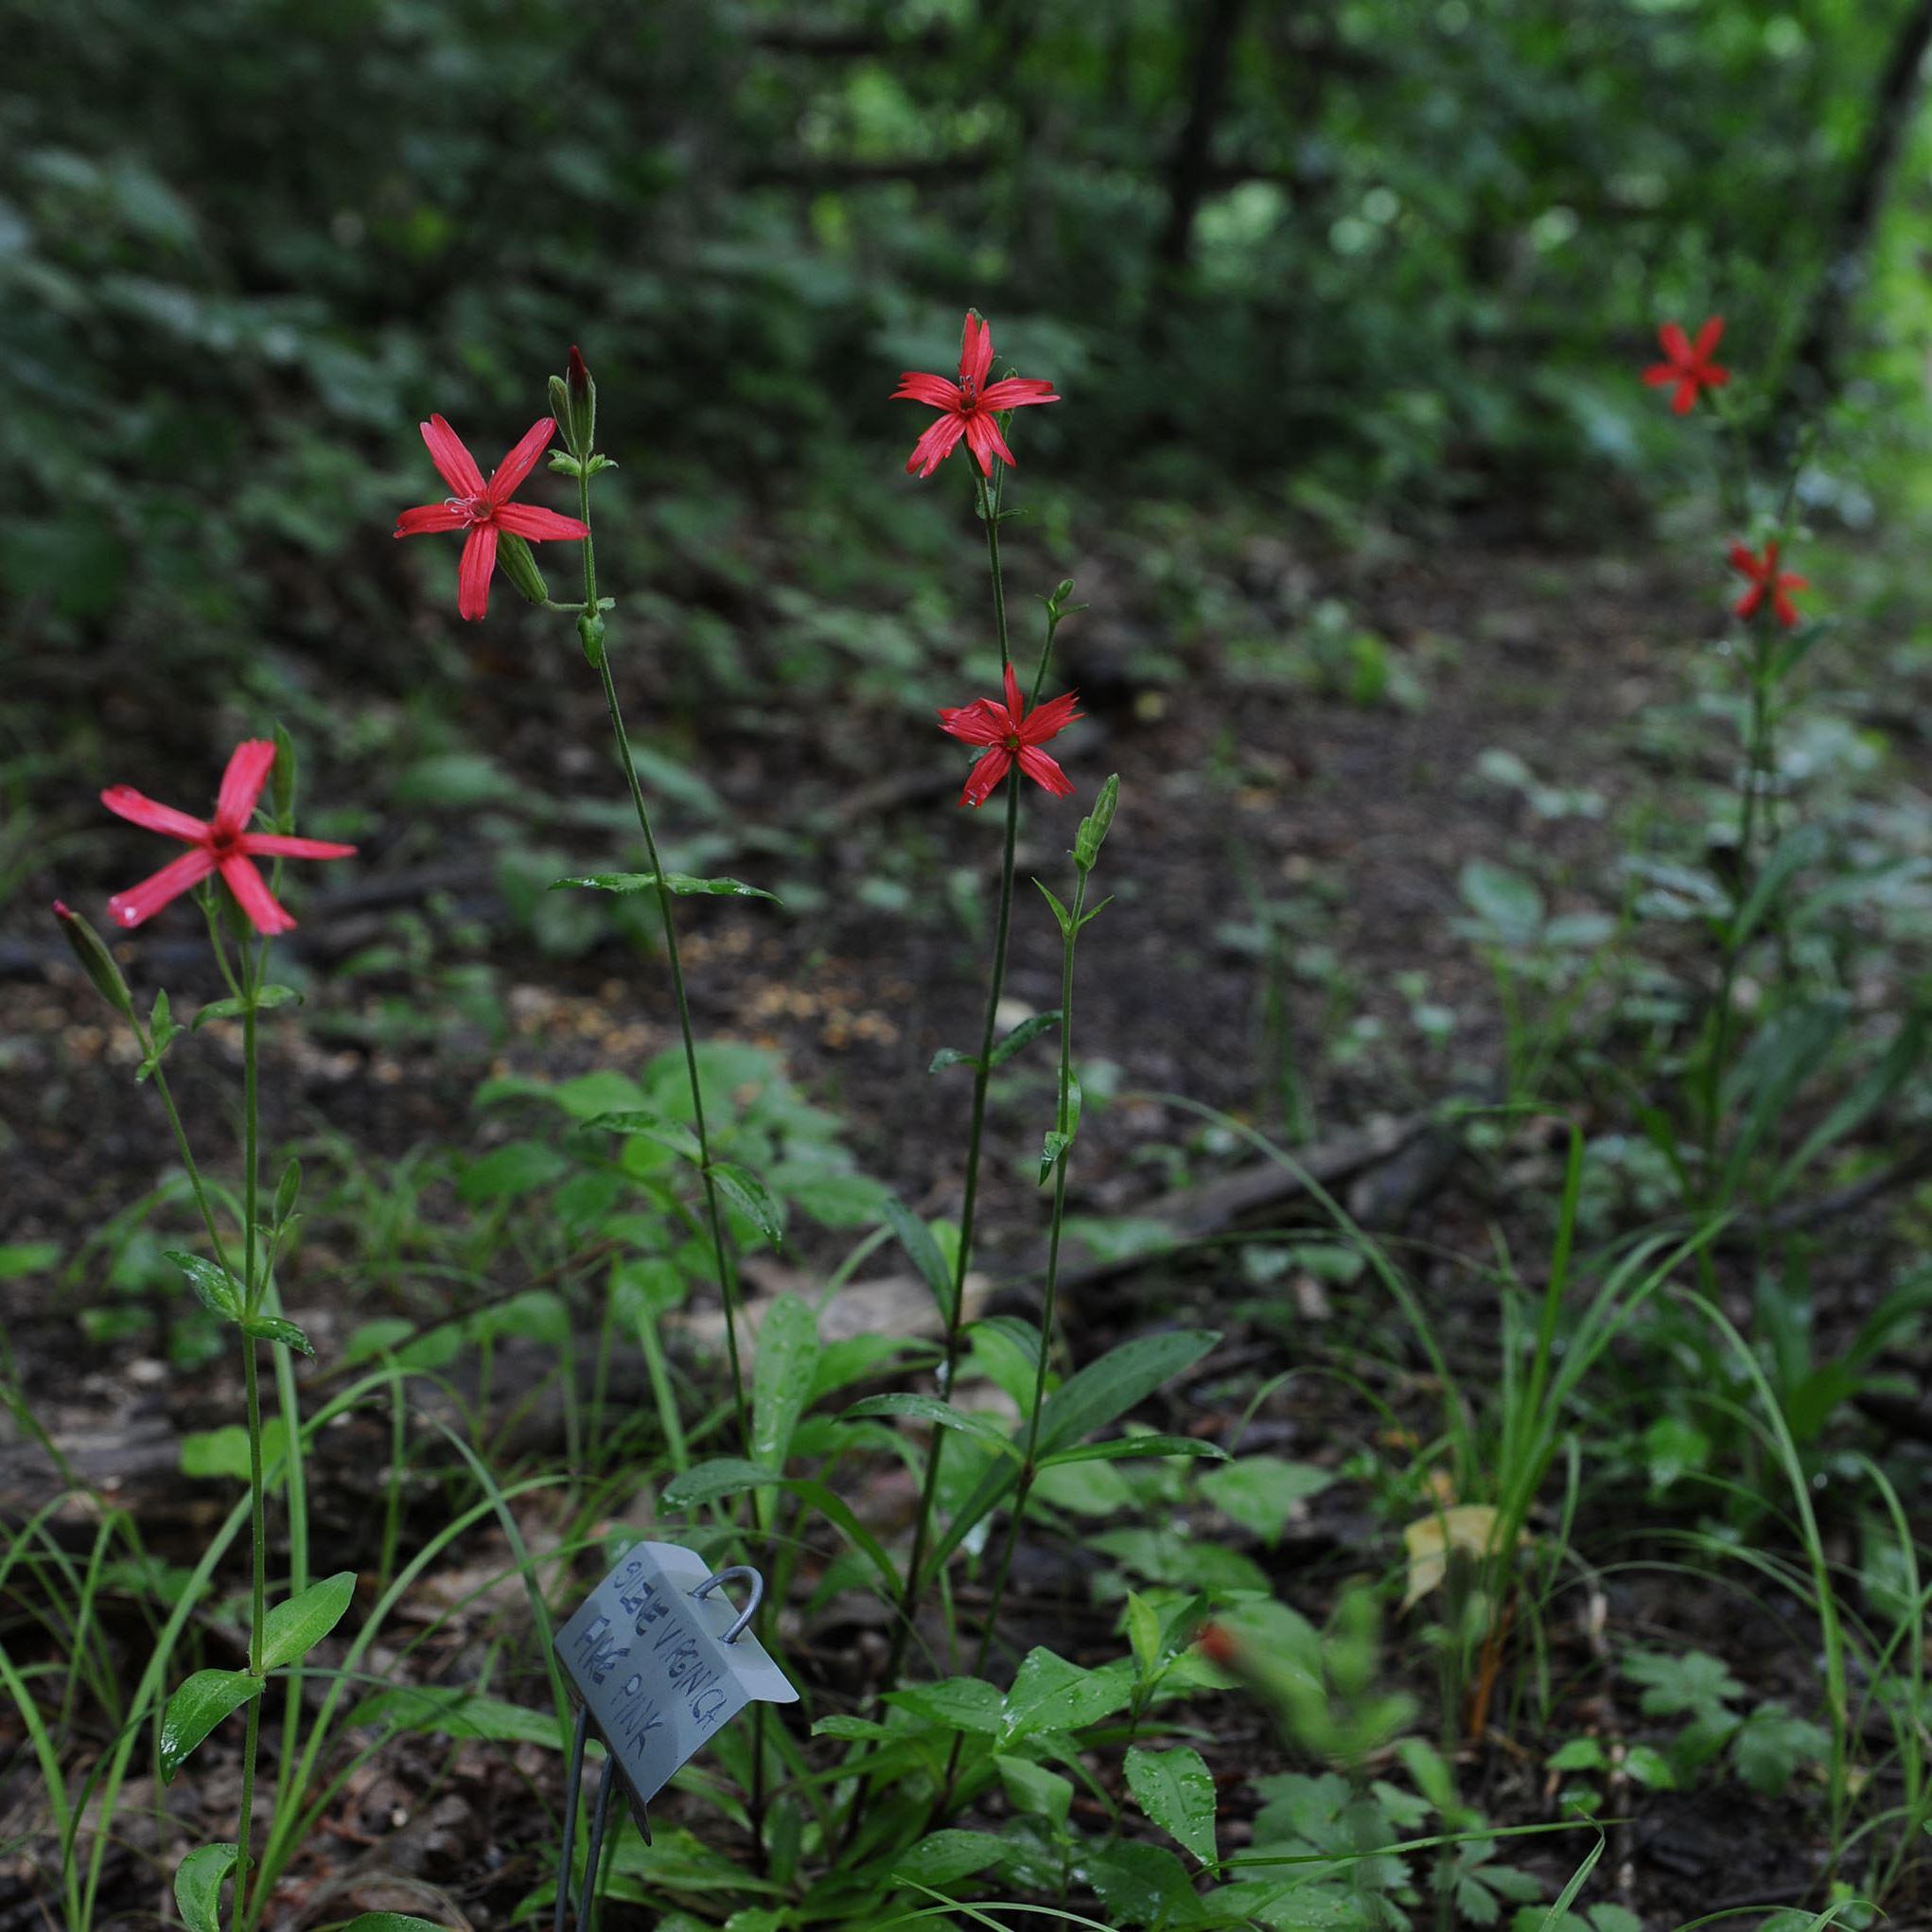 Native Pa Plants: Native Plants The Stars Along Powdermill Reserve's Trails